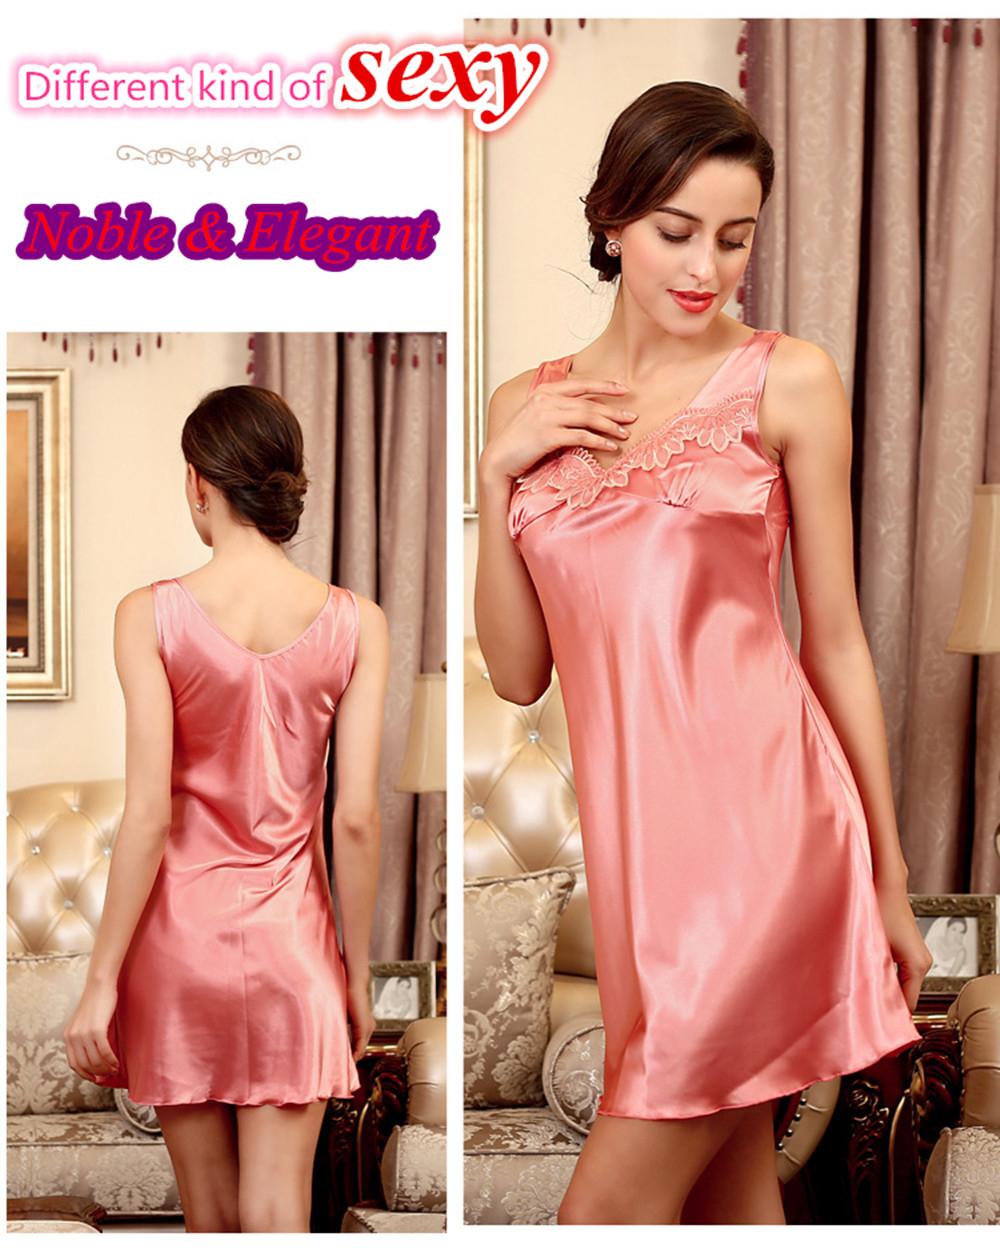 Rozegaga hot sexy nightgown women night dress silk bat pajamas comfortable silk babydoll nightwear elegant lingerie(China (Mainland))